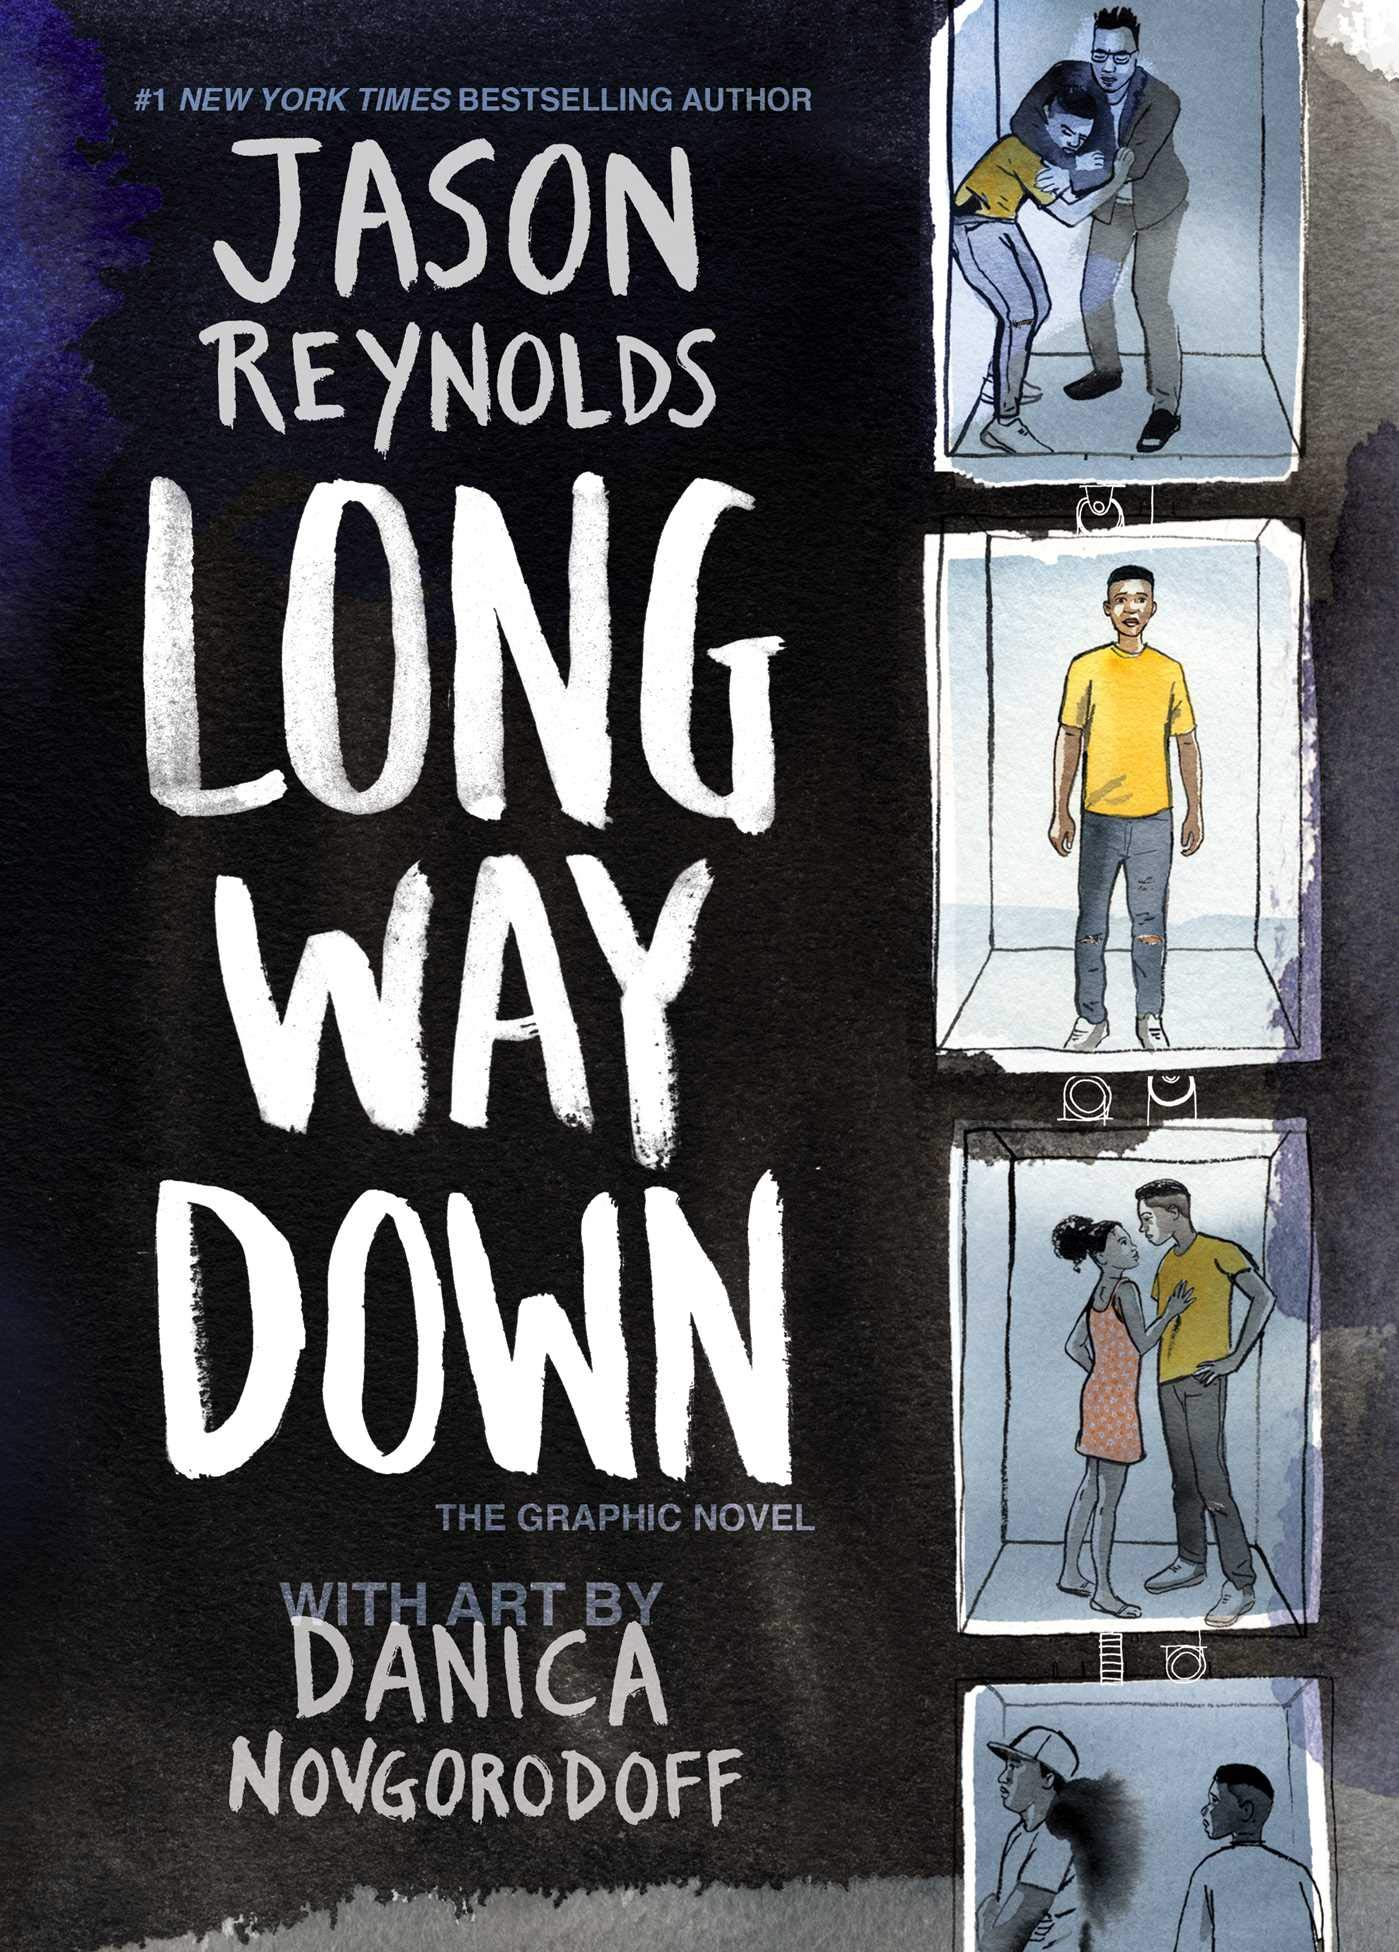 Amazon.com: Long Way Down: The Graphic Novel (9781534444959): Reynolds,  Jason, Novgorodoff, Danica: Books